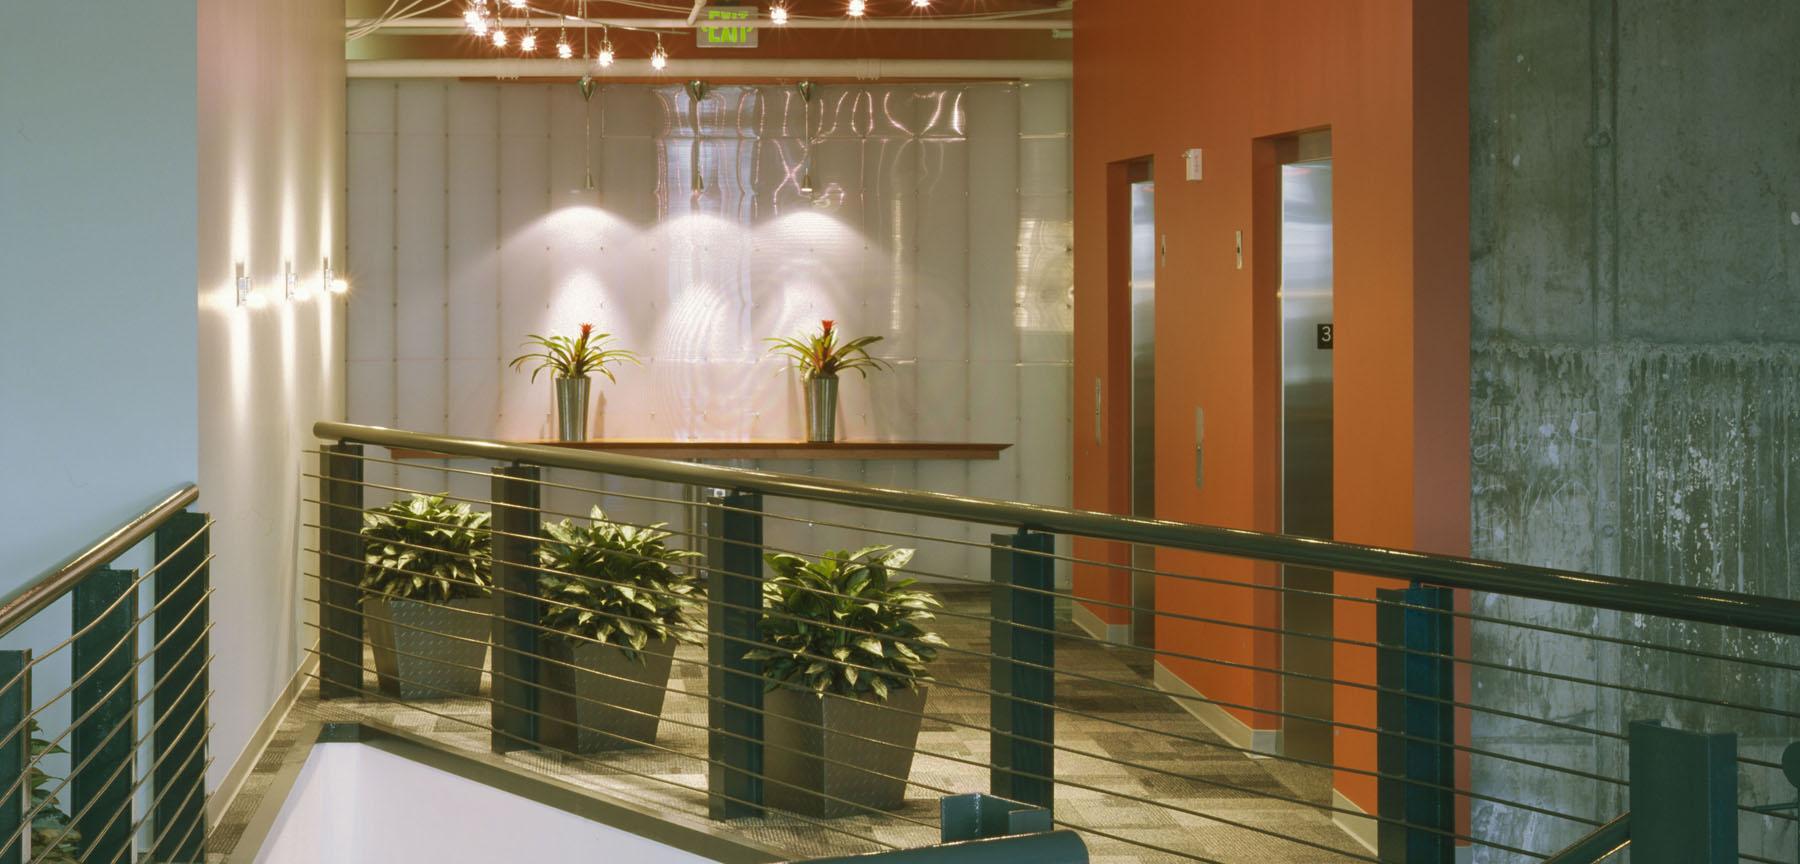 Integer Advertising Agency elevators